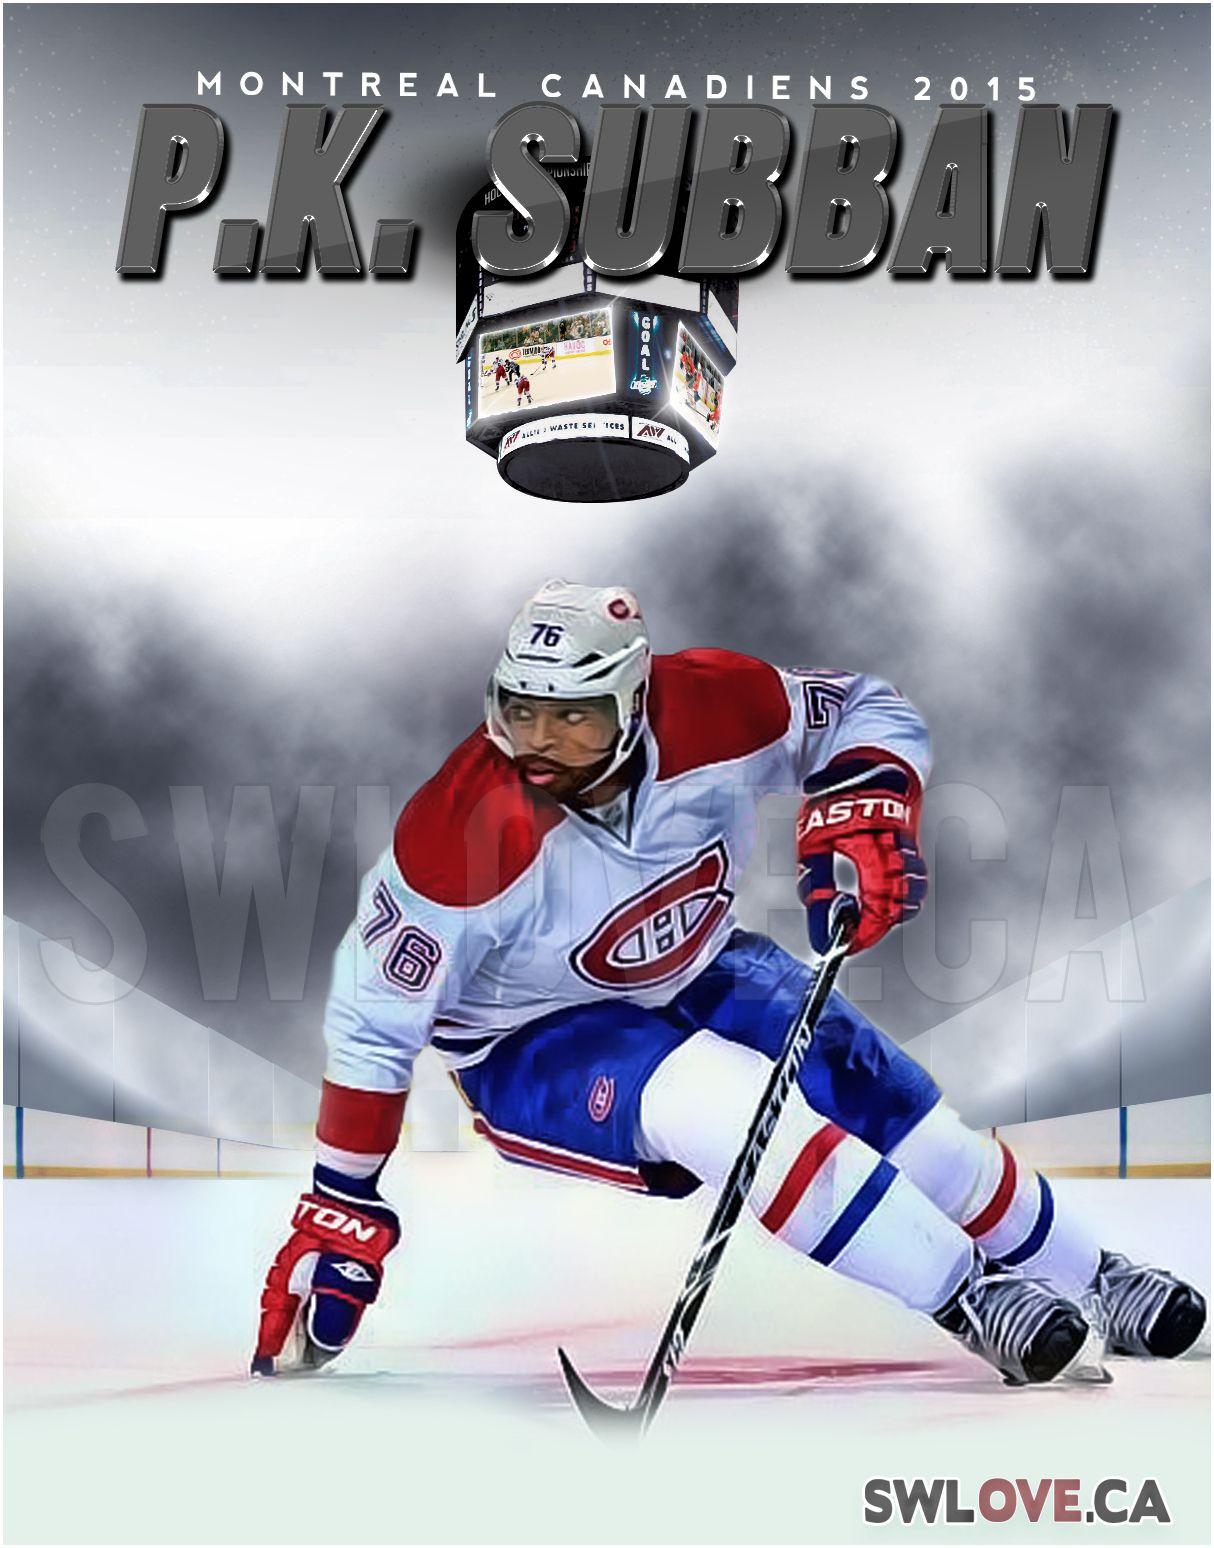 P.K. Subban 5